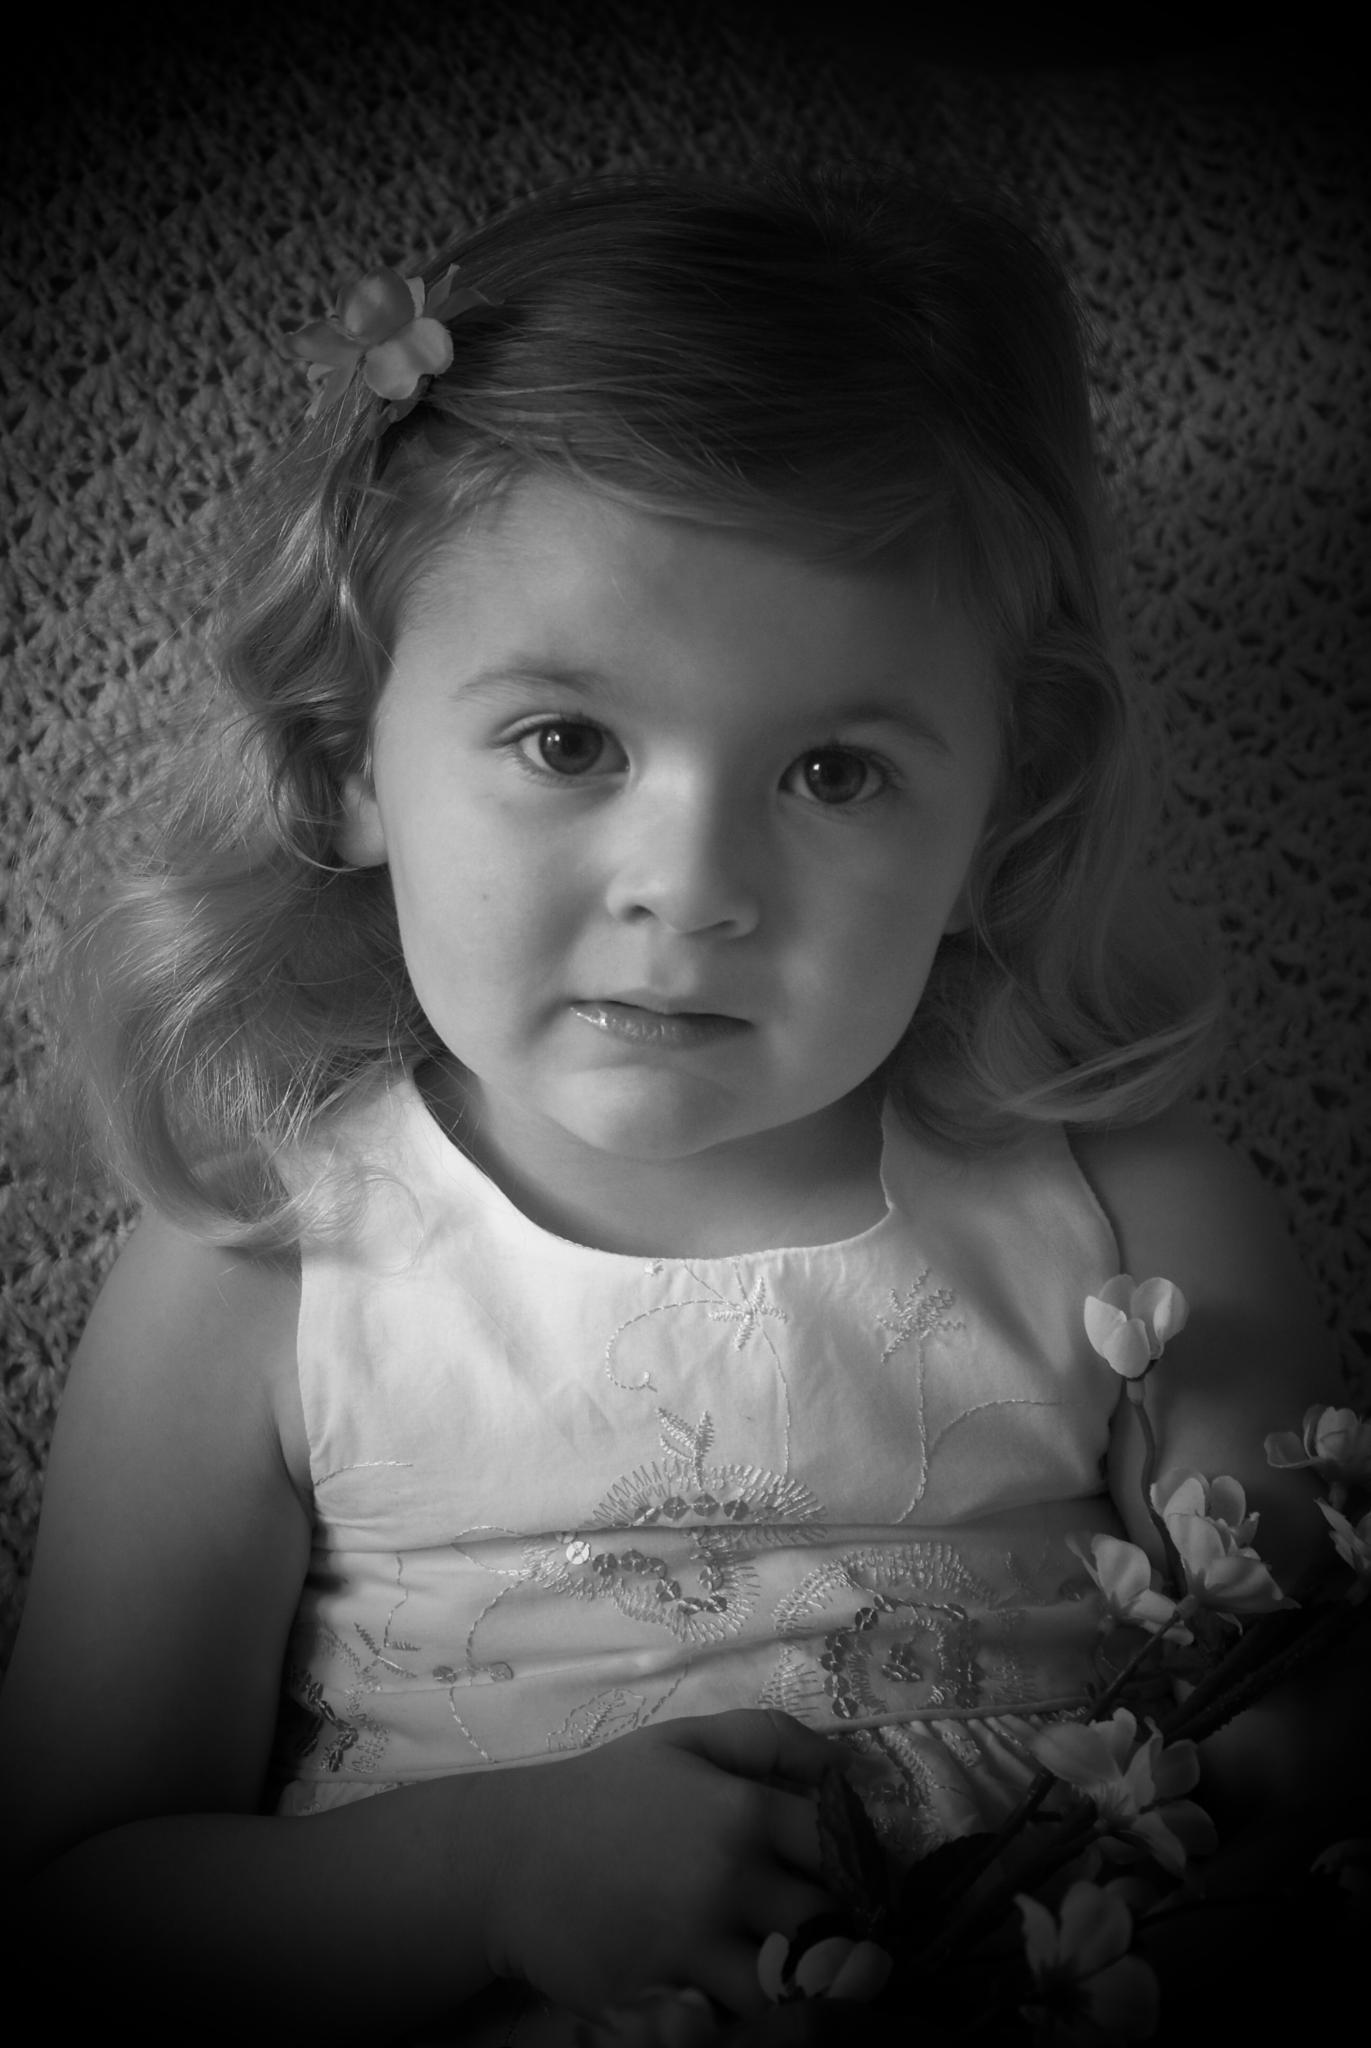 My lovely Cousin by Neil Bartlett